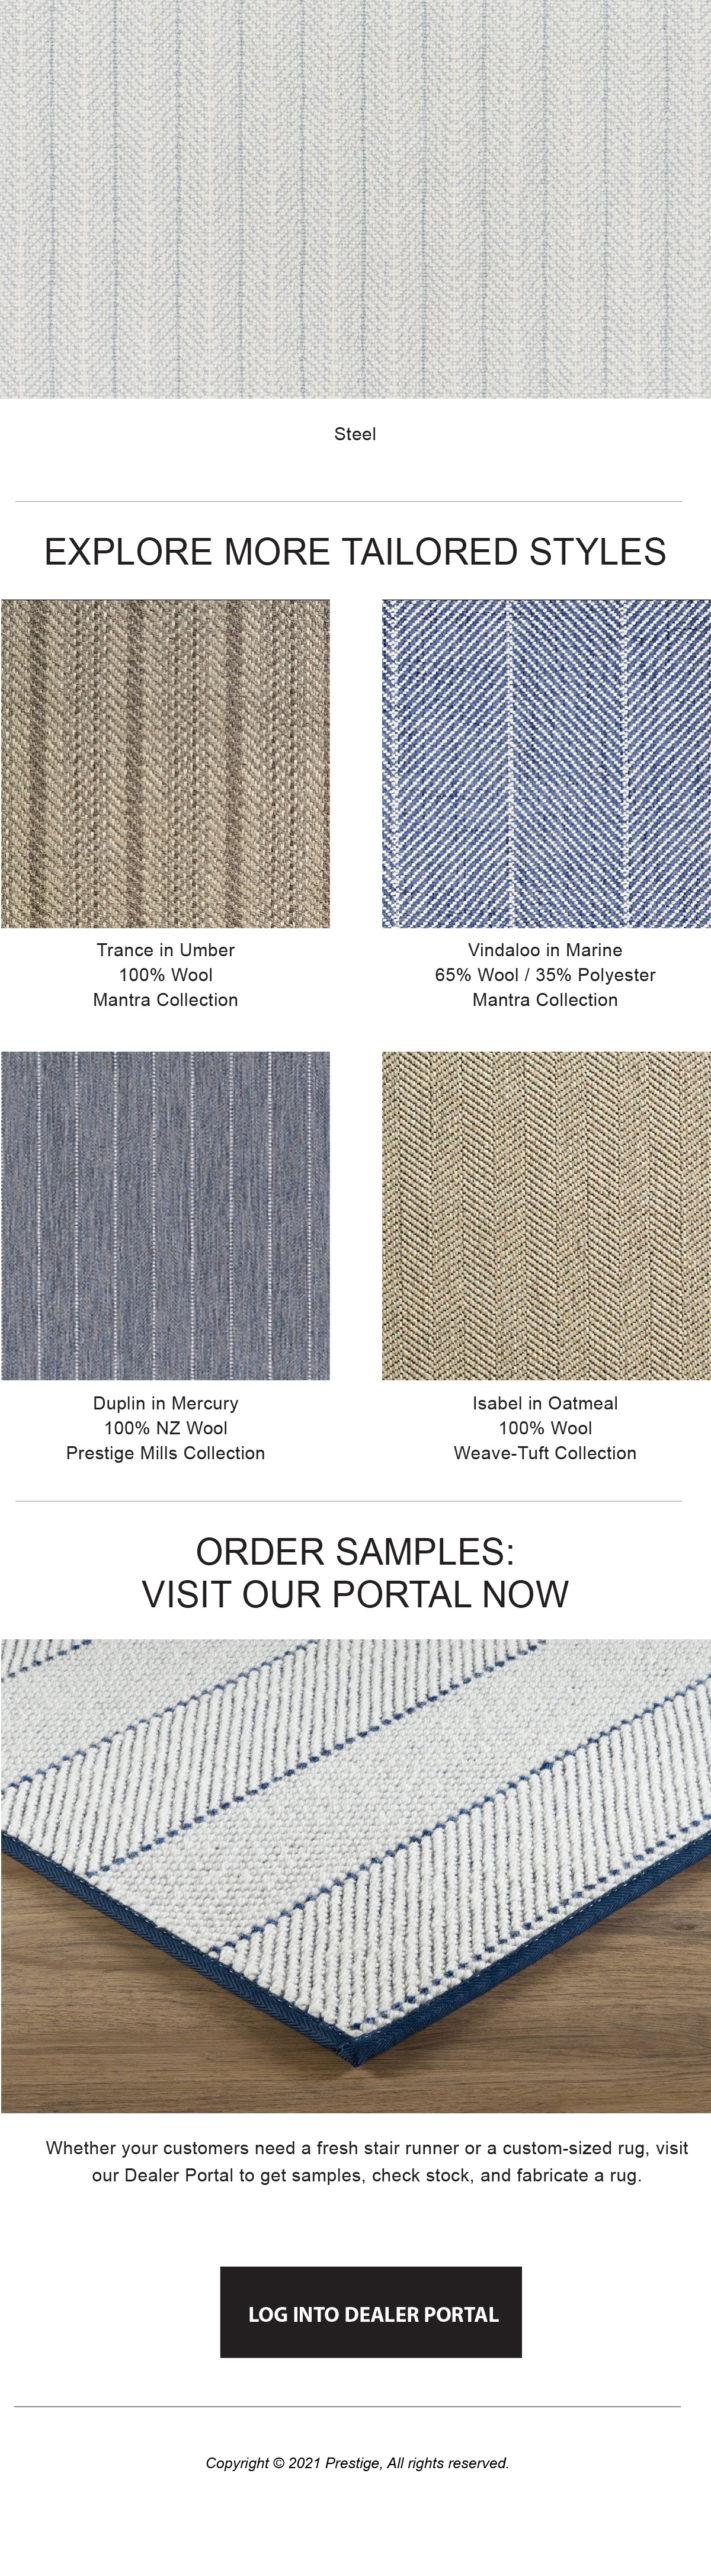 081021-Prestige Mills roper & kimi images